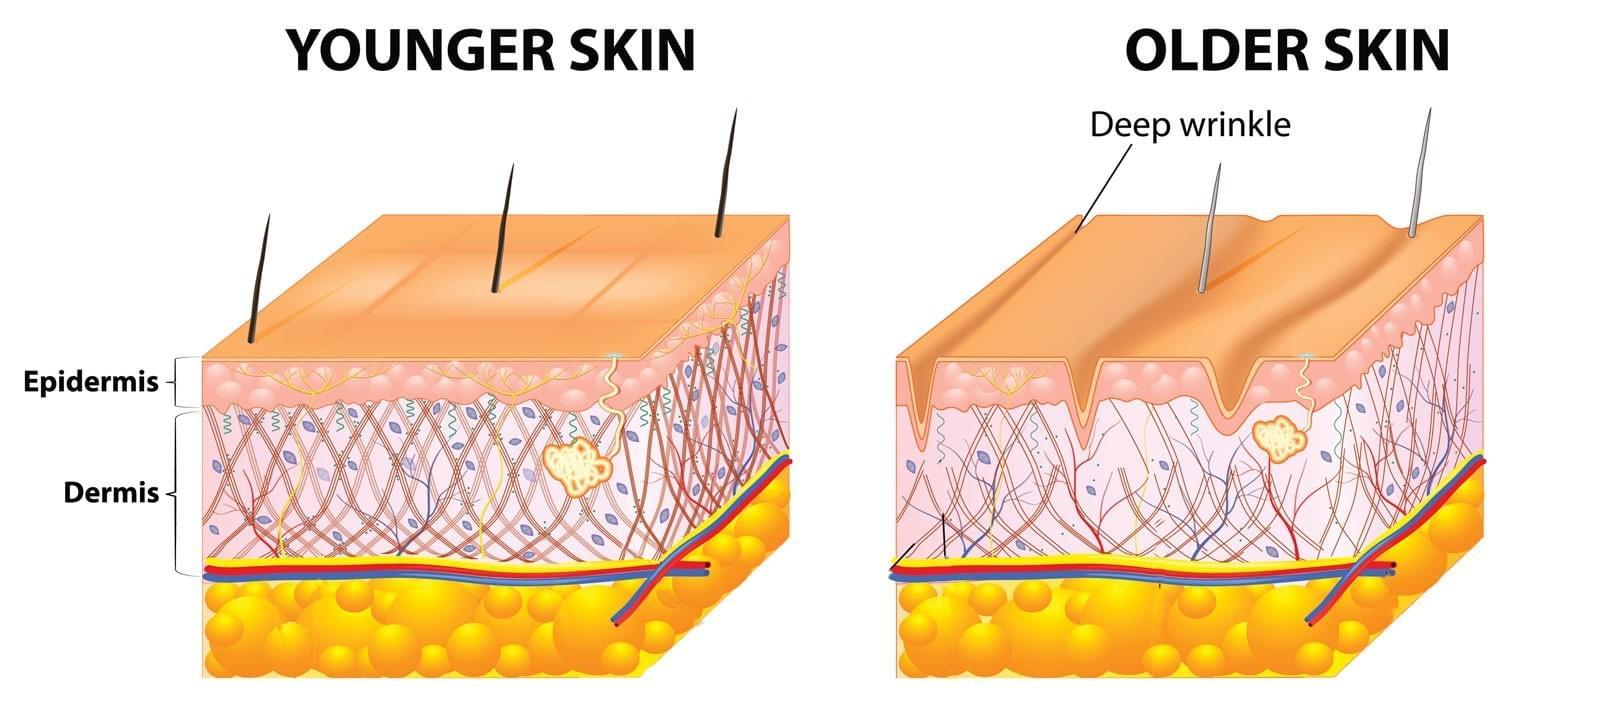 Young Skin vs. Old Skin